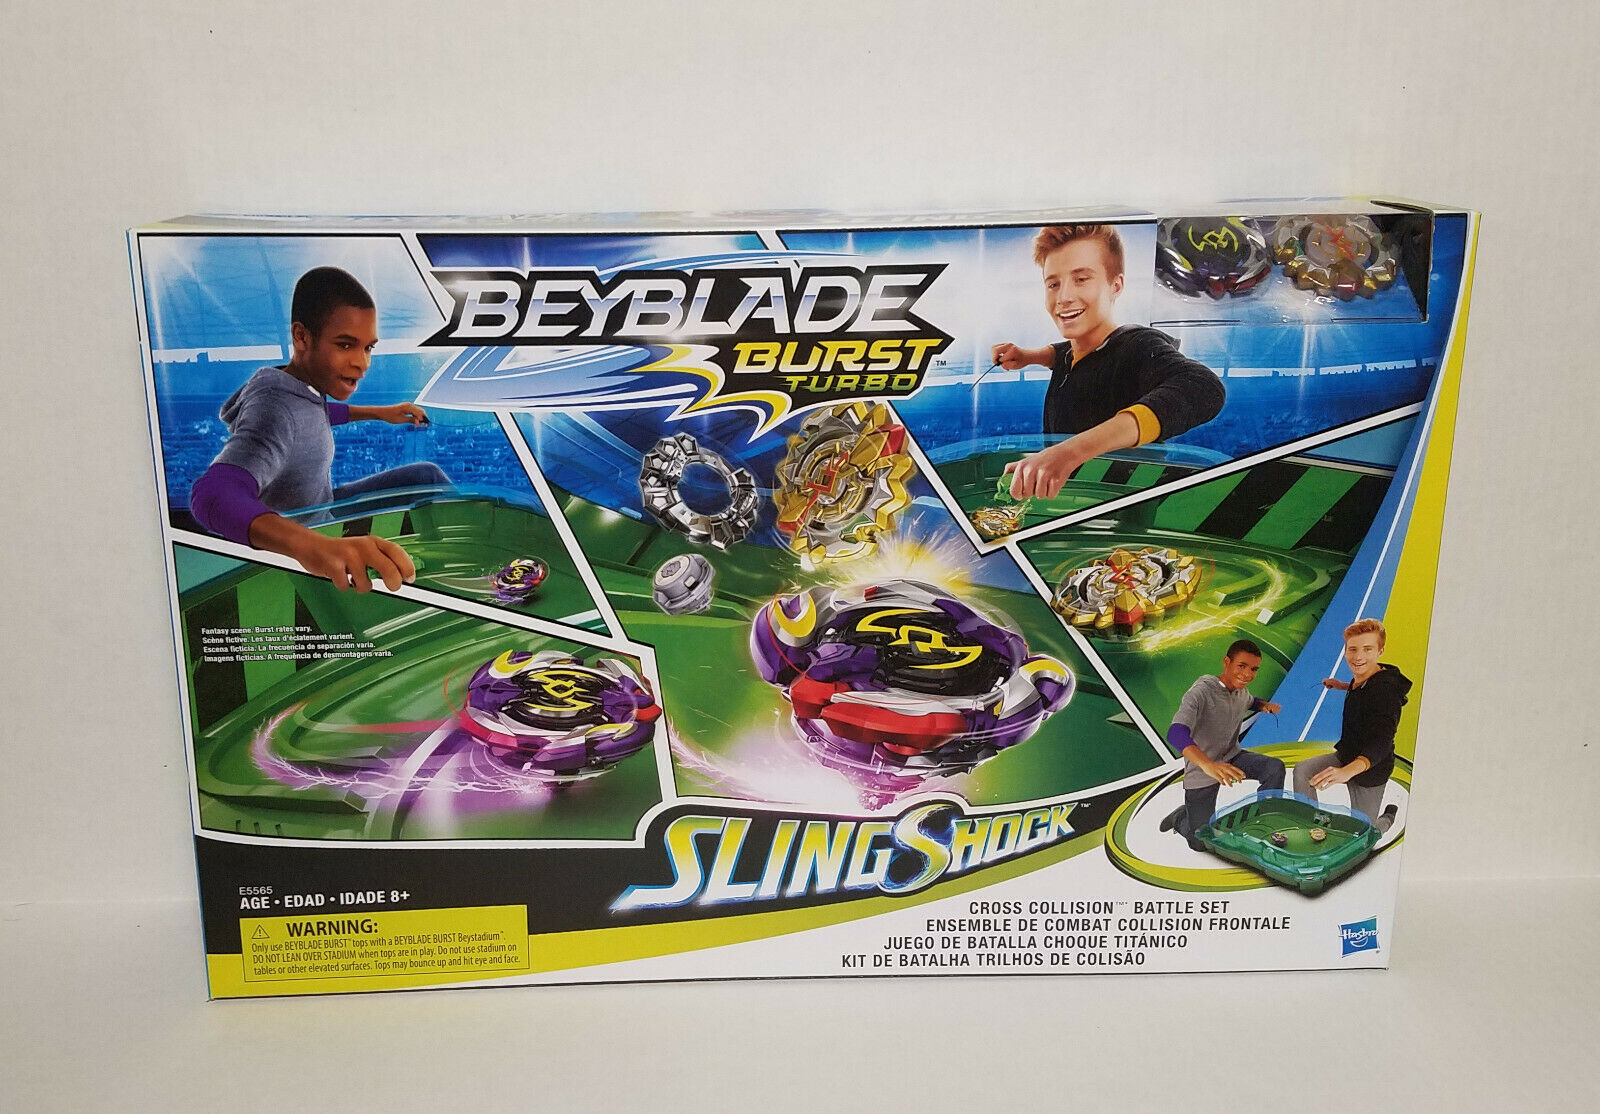 BEYBLADE Burst Turbo Slingshock Cross Collision Battle Set